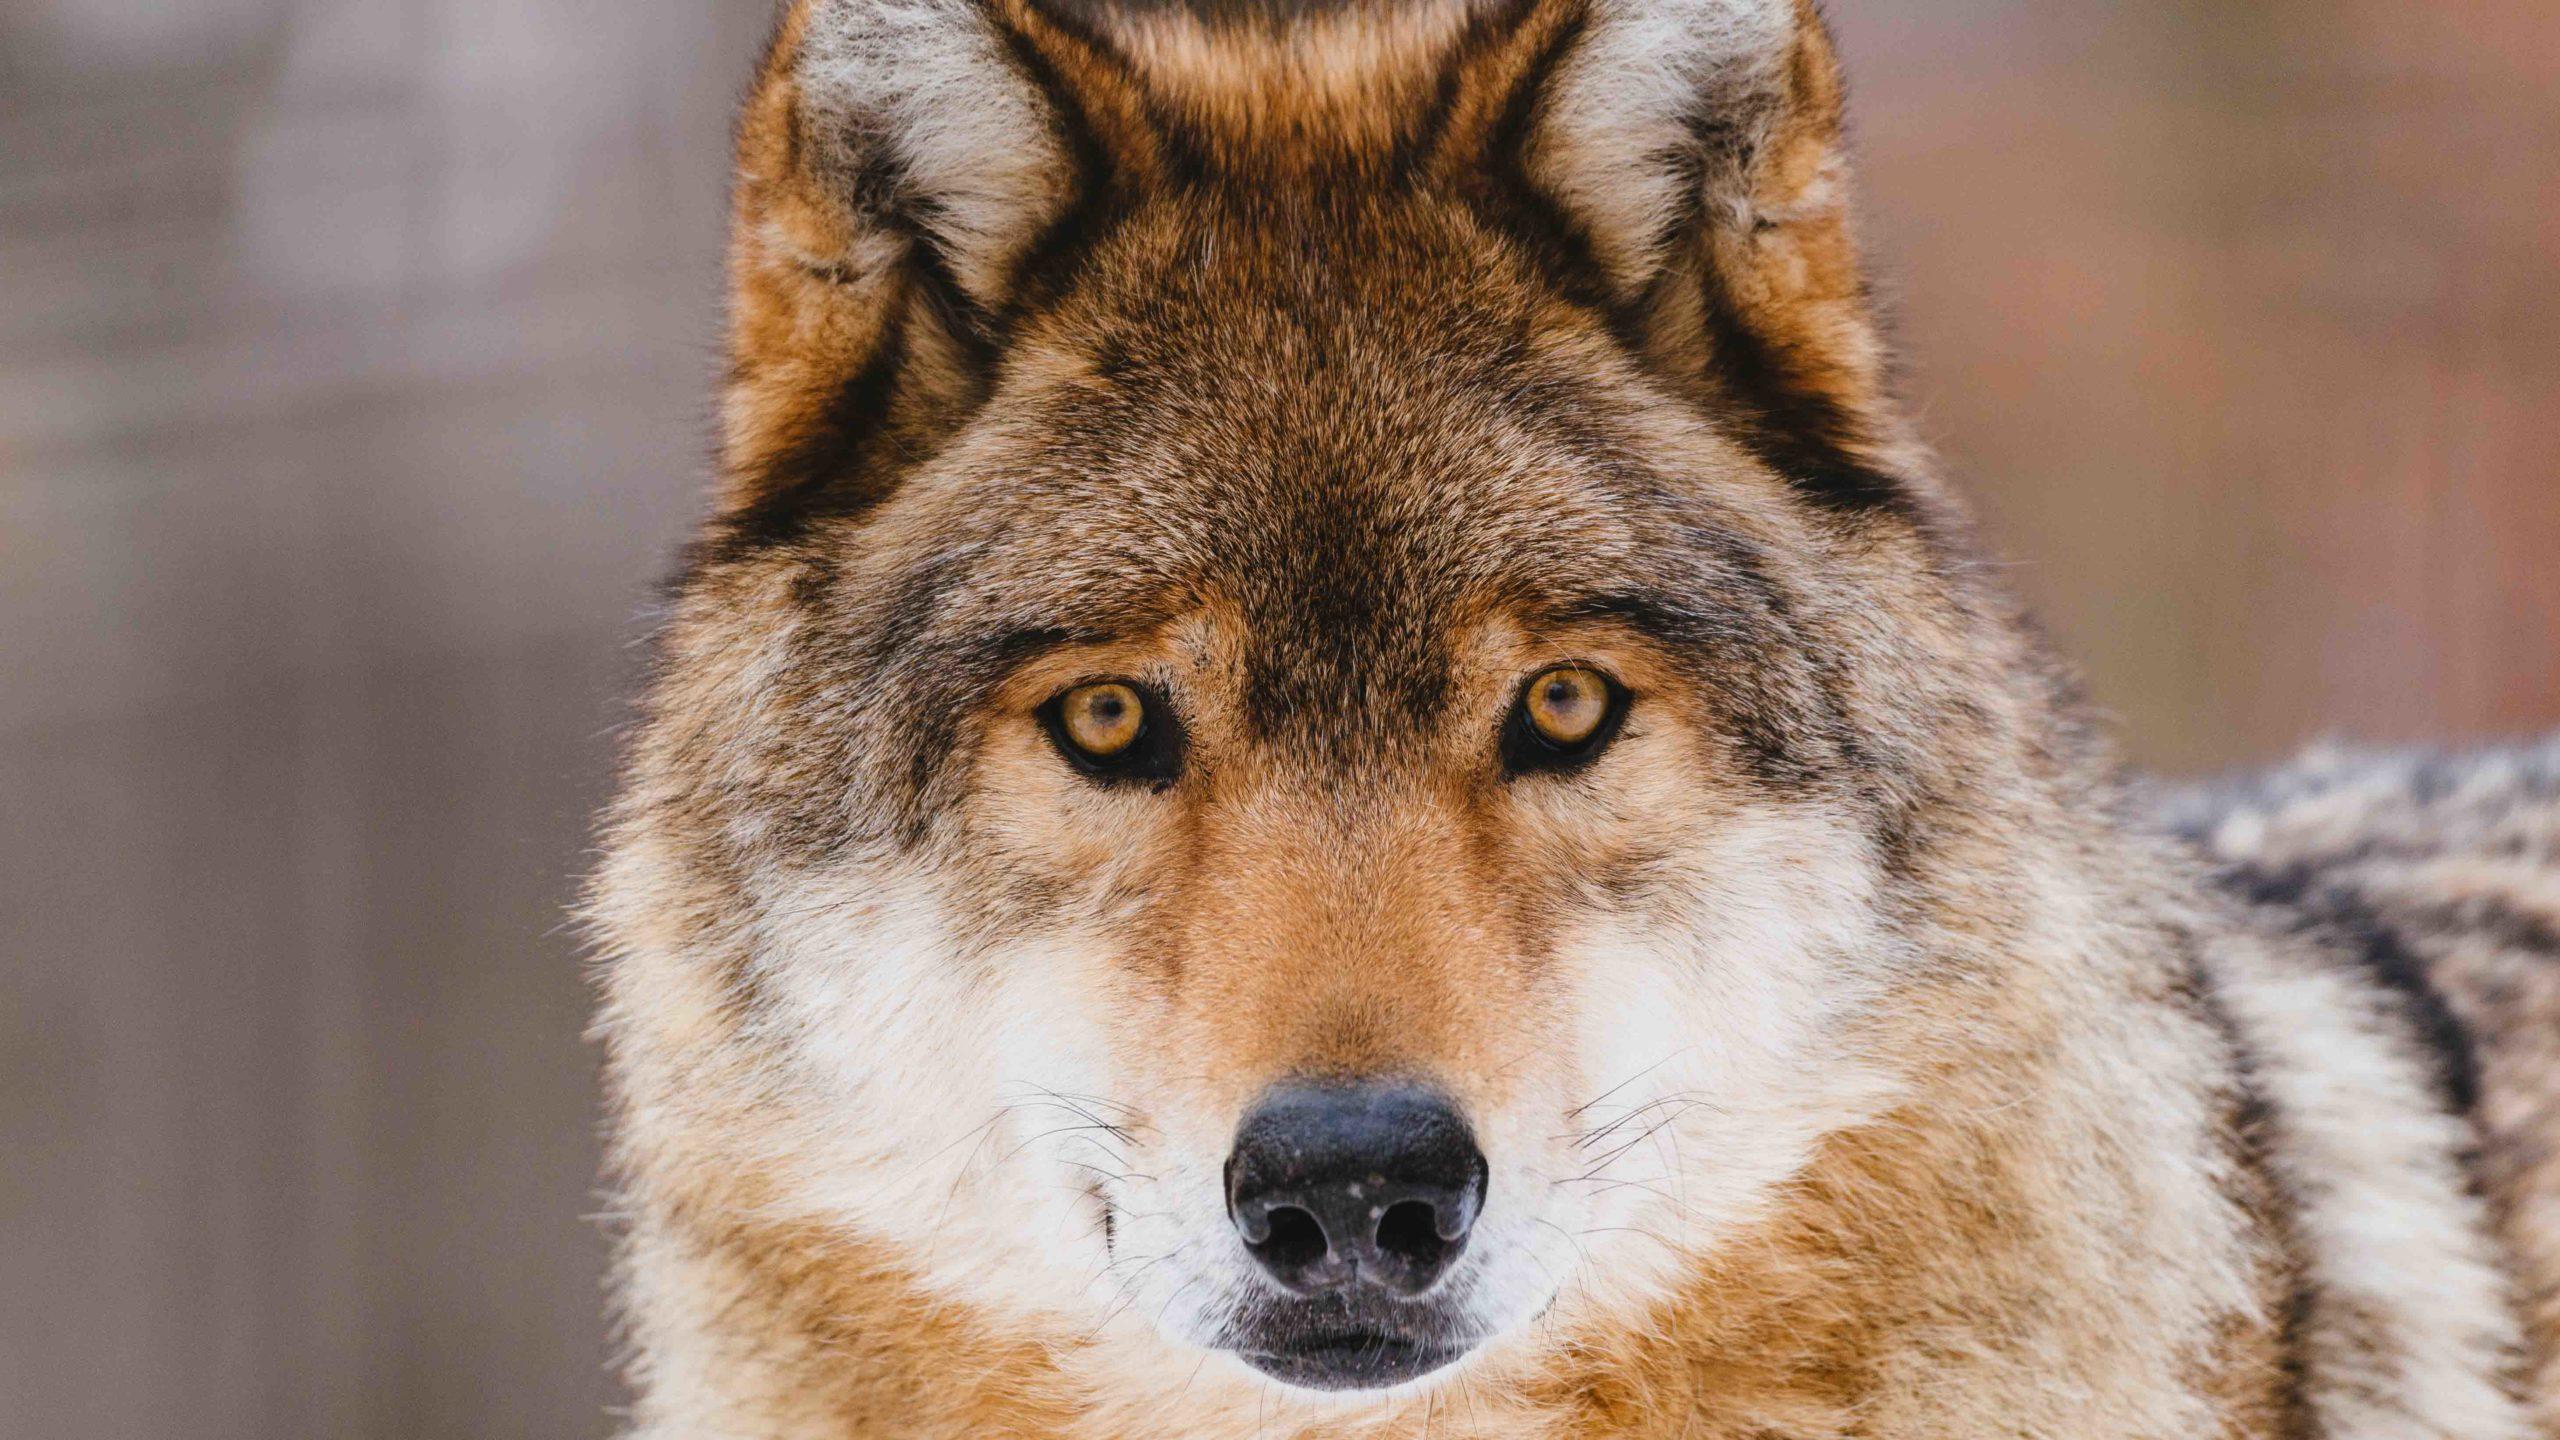 100+ Wolf Wallpaper Ideas that amaze You